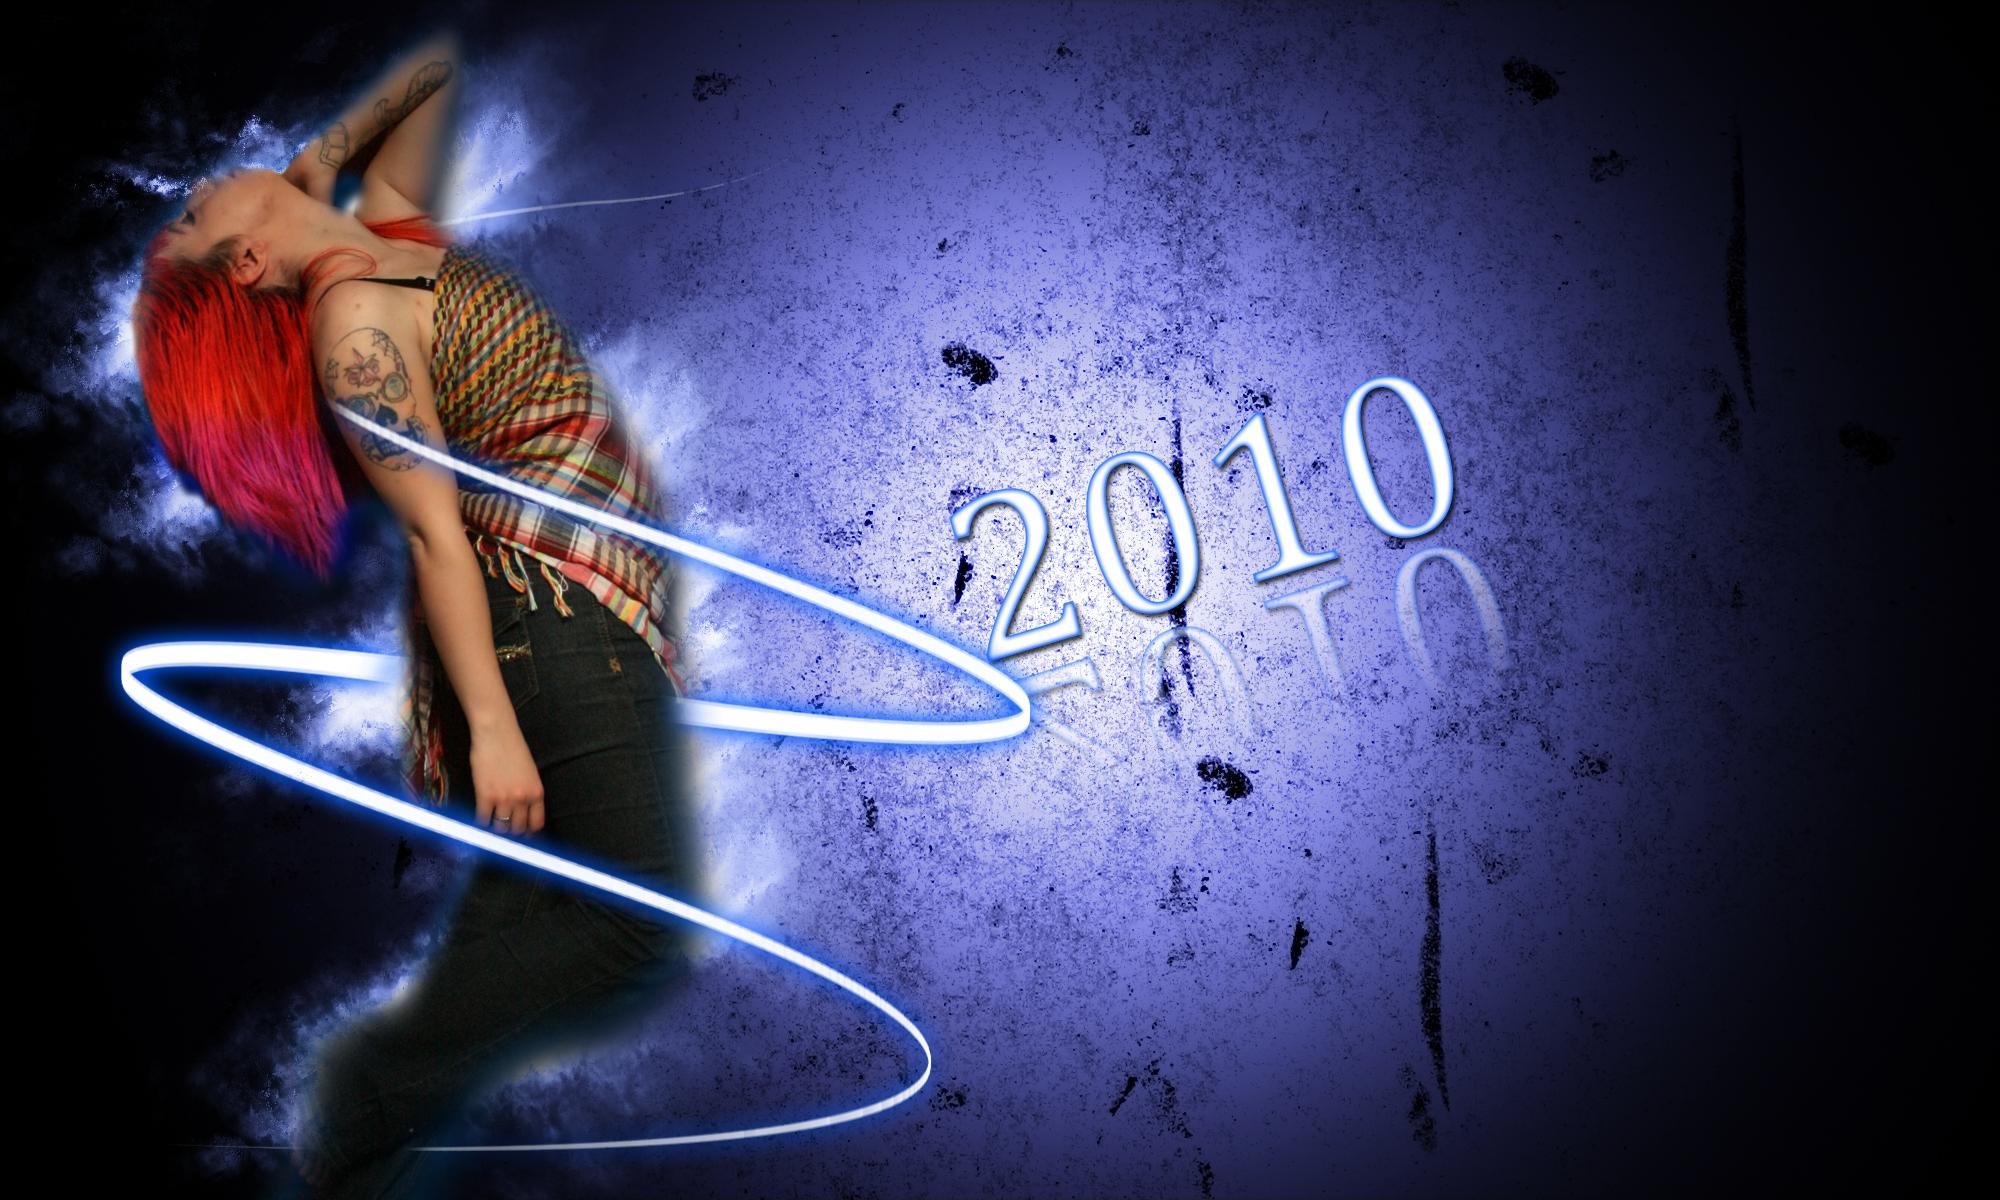 2010 Wallpaper by LifeEndsNow